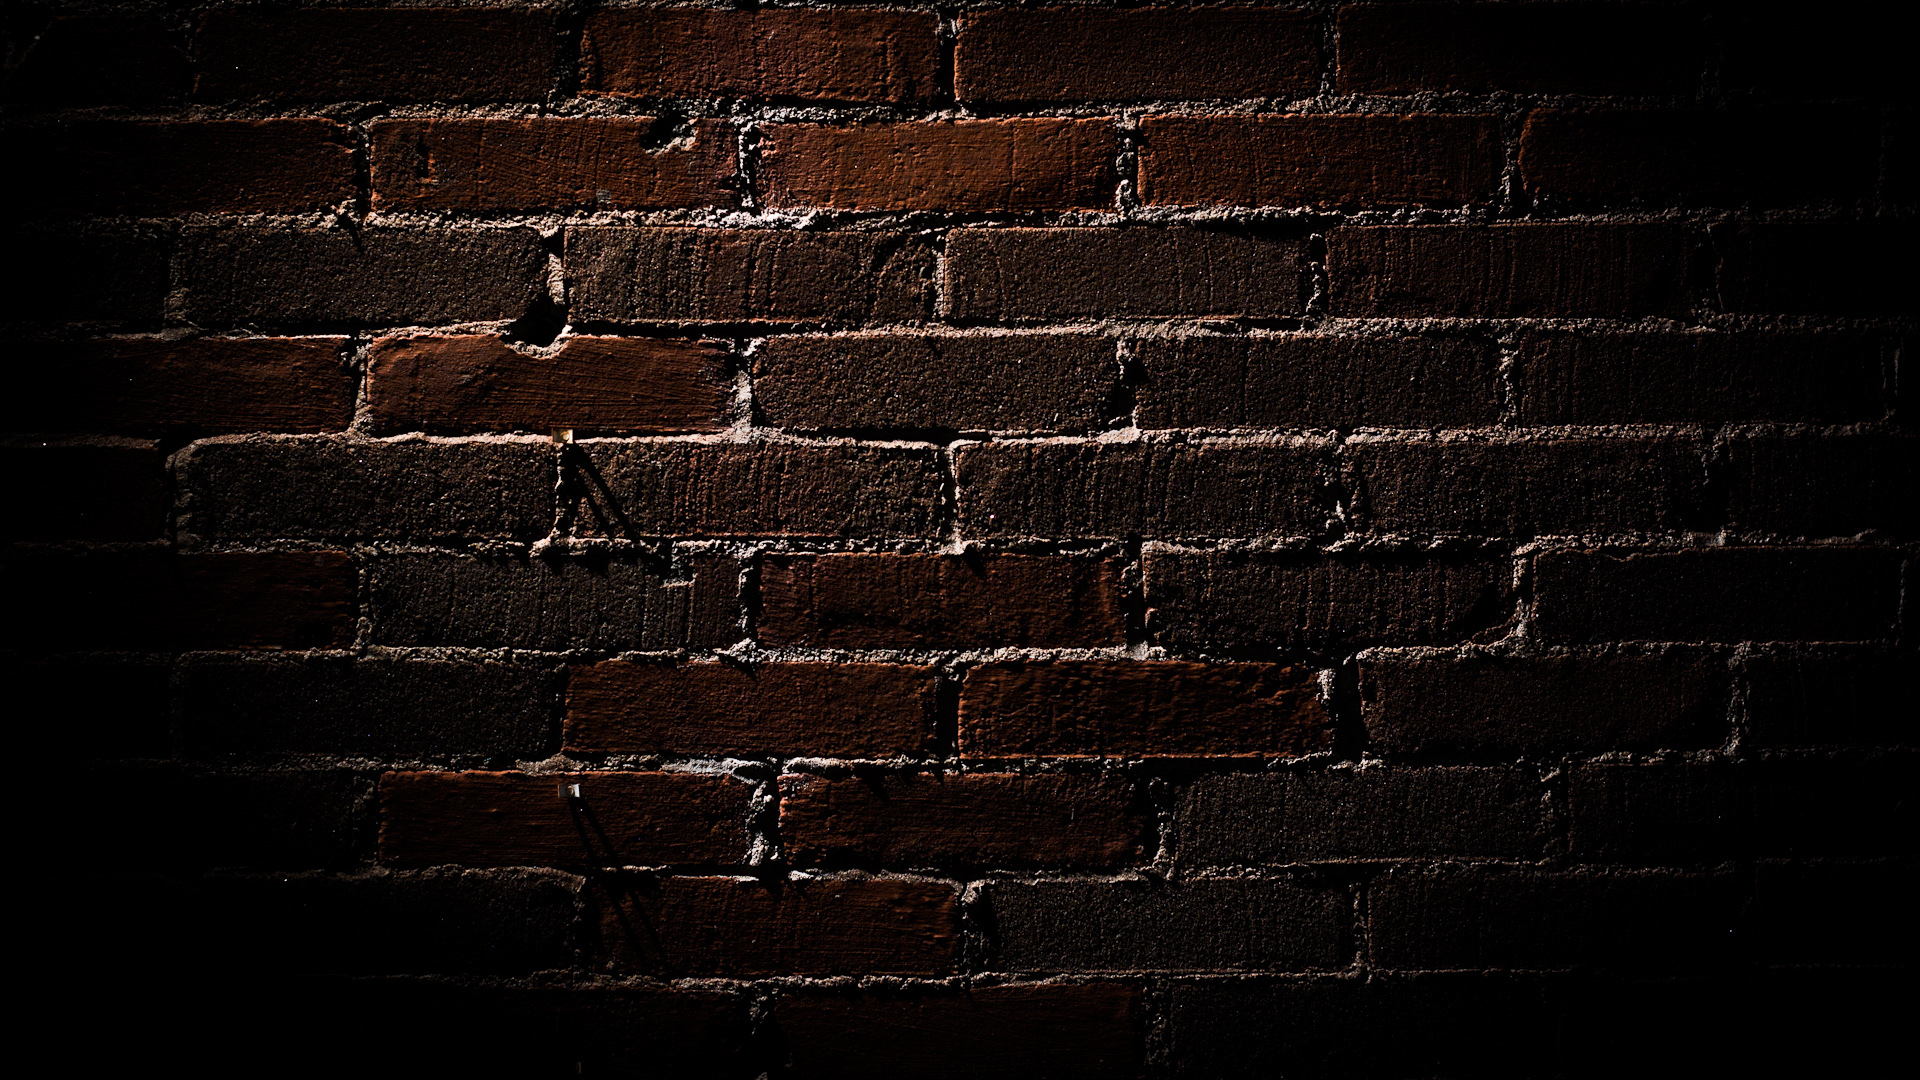 Texture brick dark wallpaper 1920x1080 75732 wallpaperup for Black 3d brick wallpaper